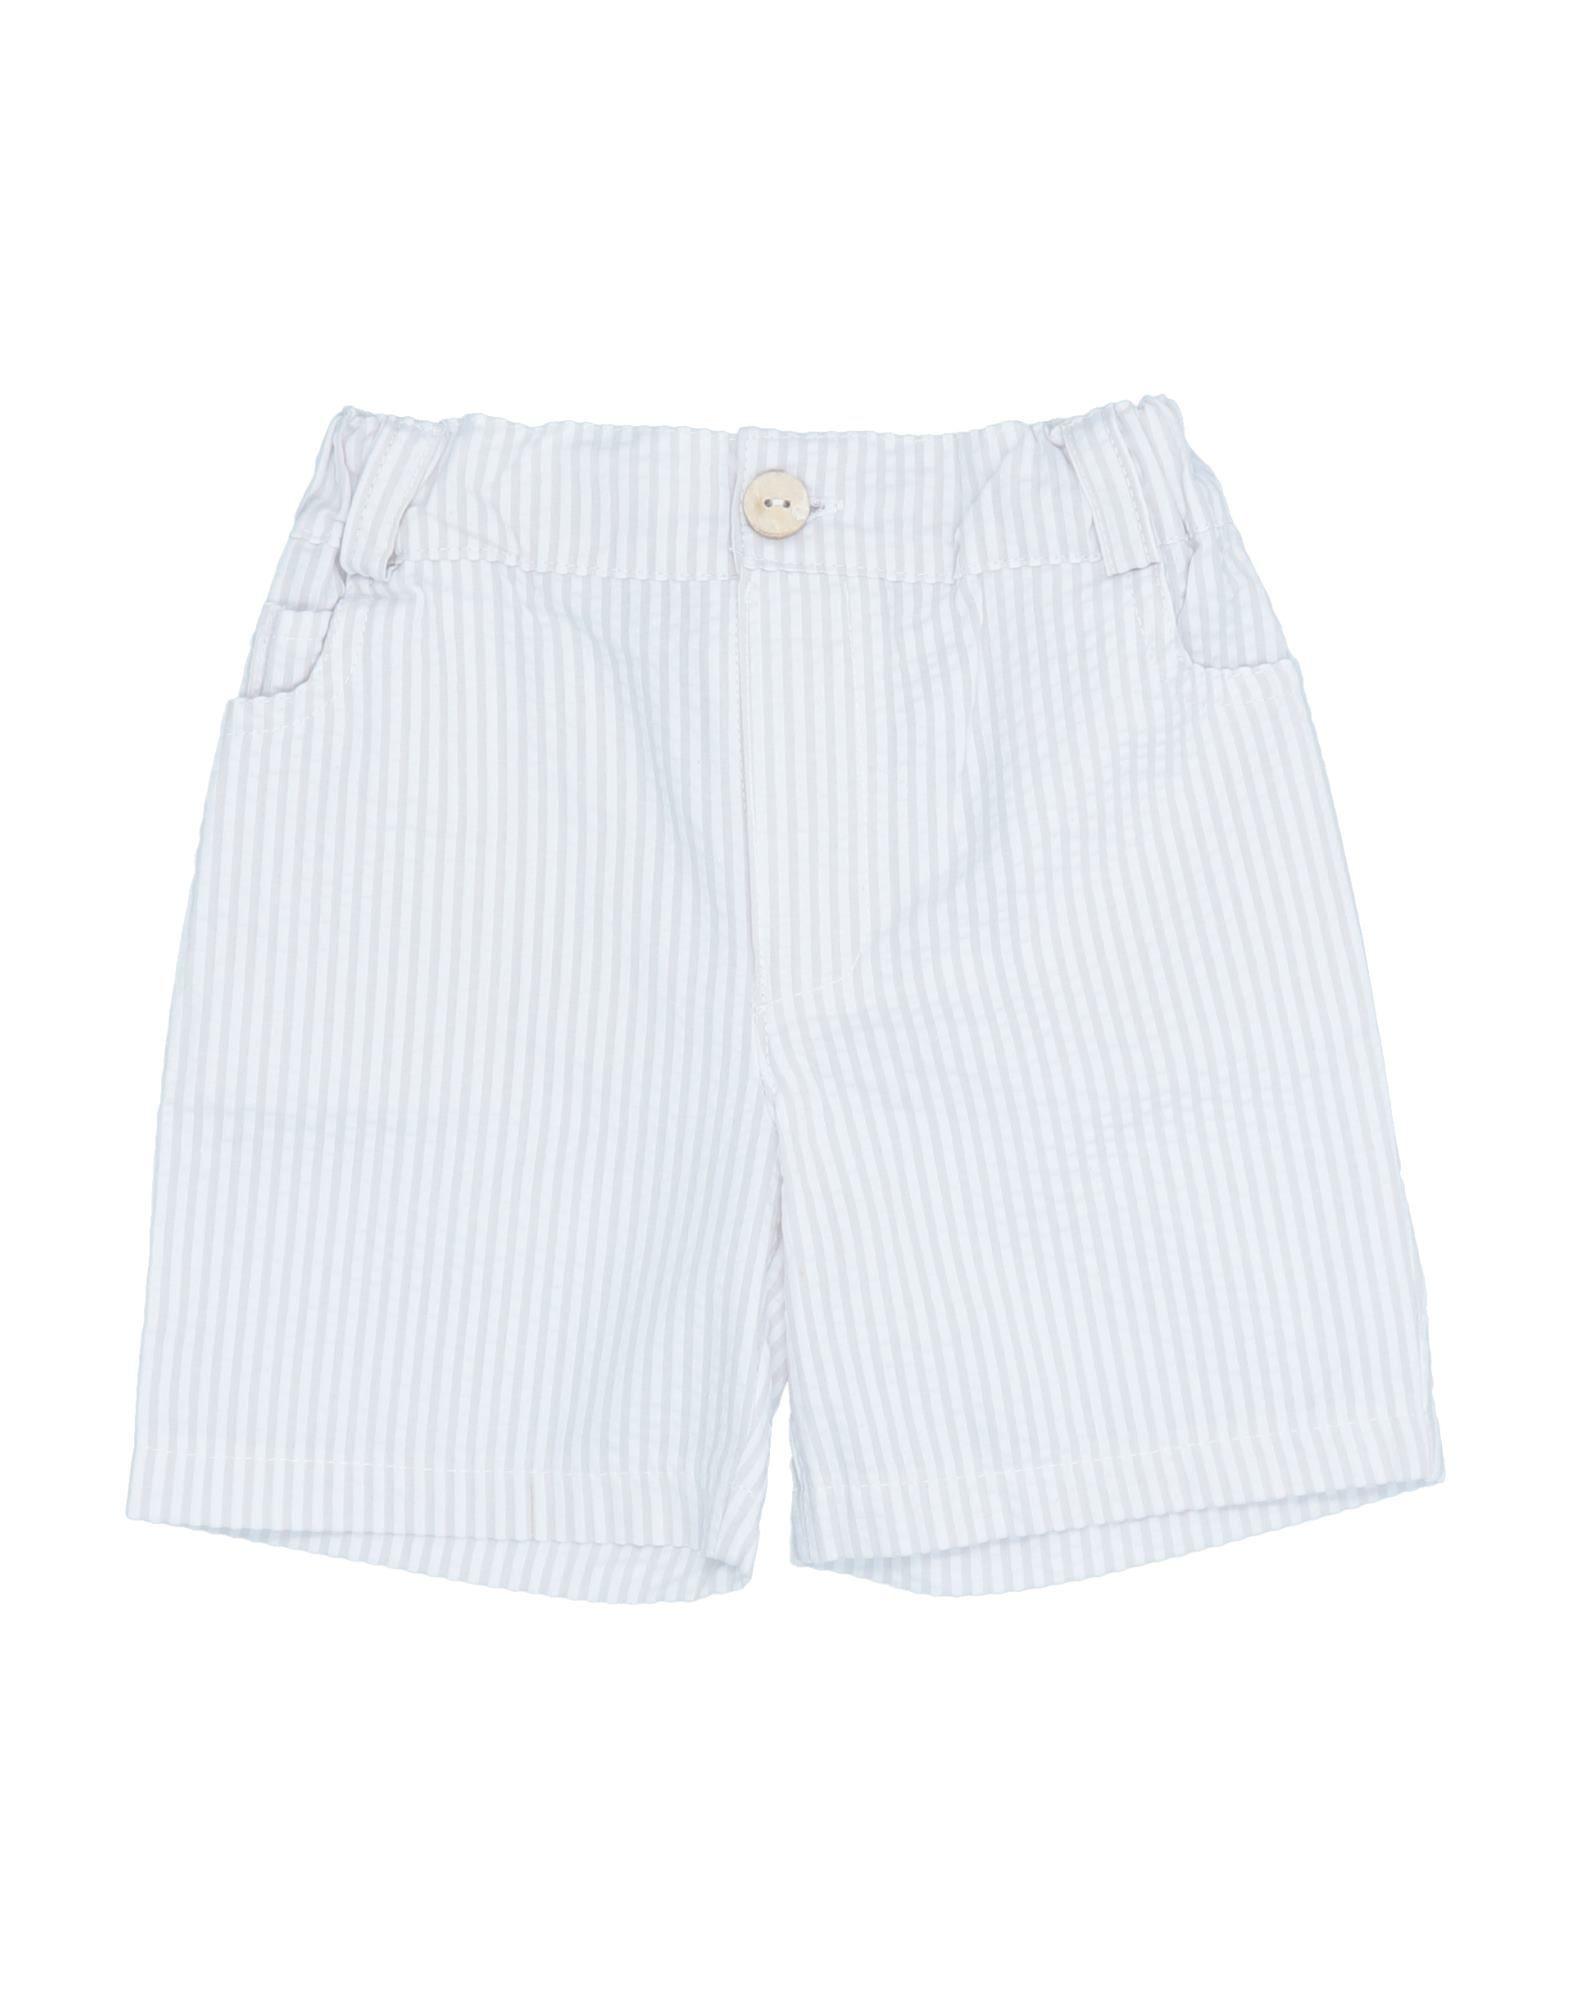 Coccodé Kids' Bermudas In White